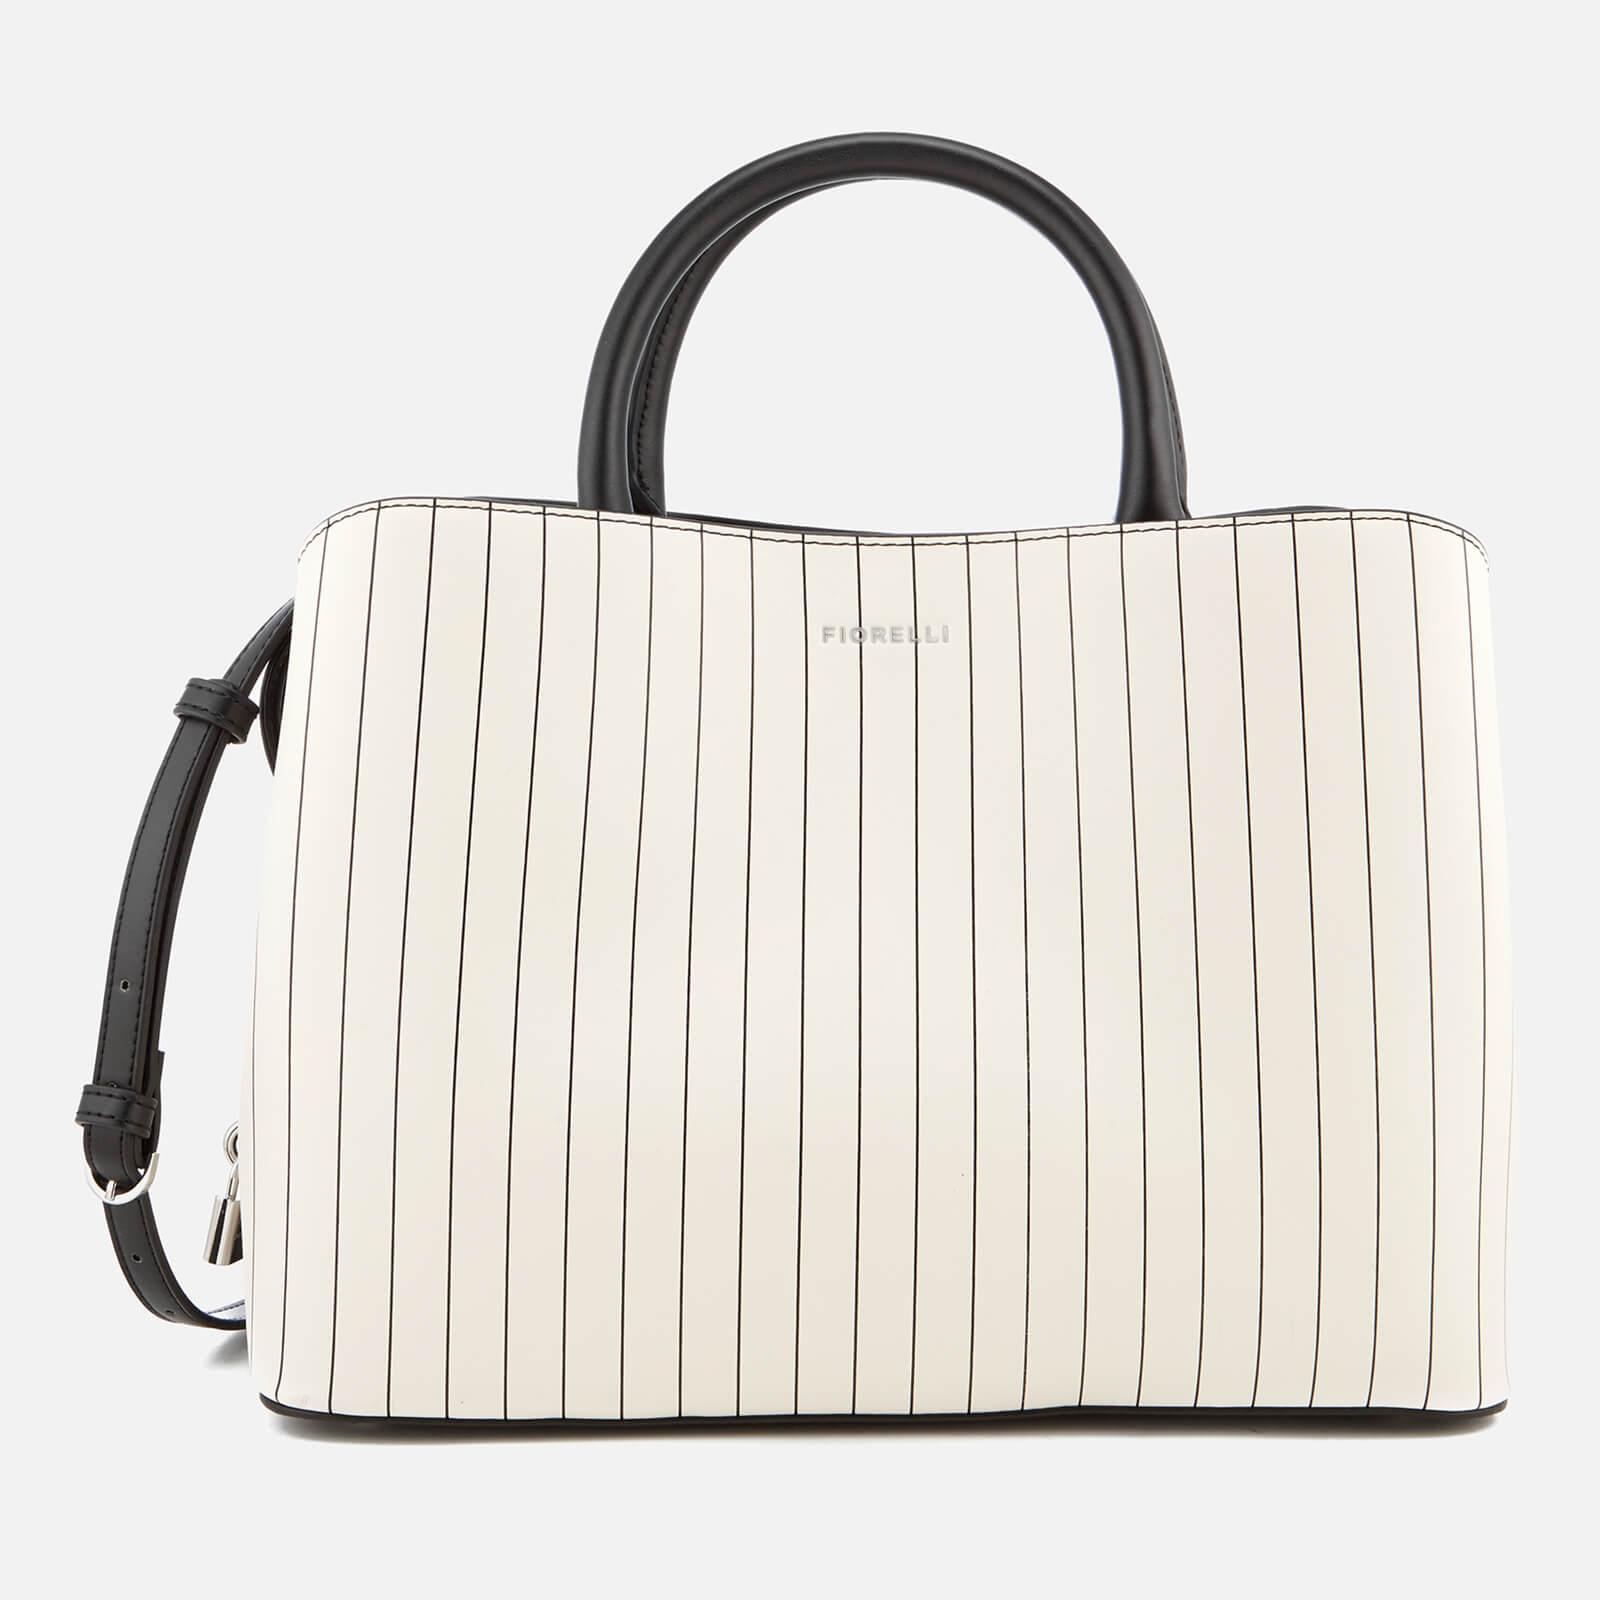 652d2d9f7fb3 Fiorelli Women's Bethnal Triple Compartment Tote Bag - Pin Stripe Mix  Clothing | TheHut.com